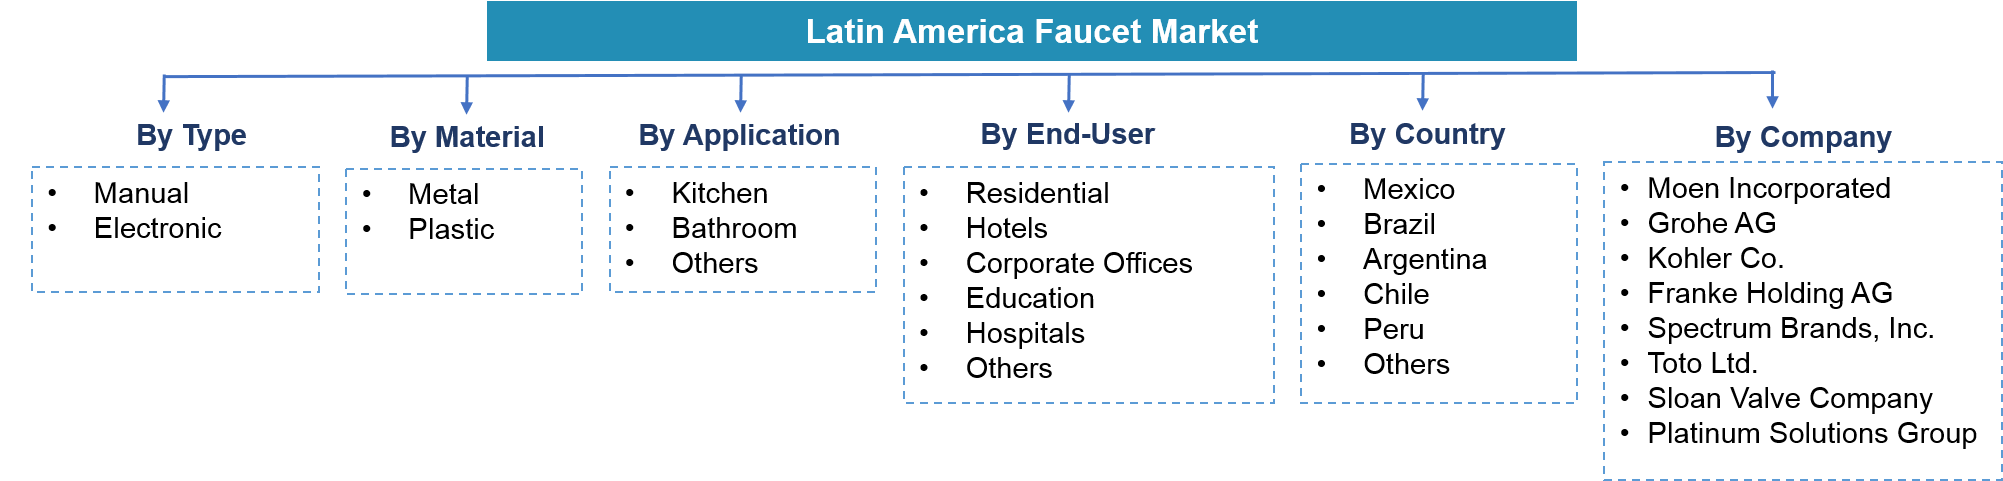 Latin America Faucet Market Segmentation